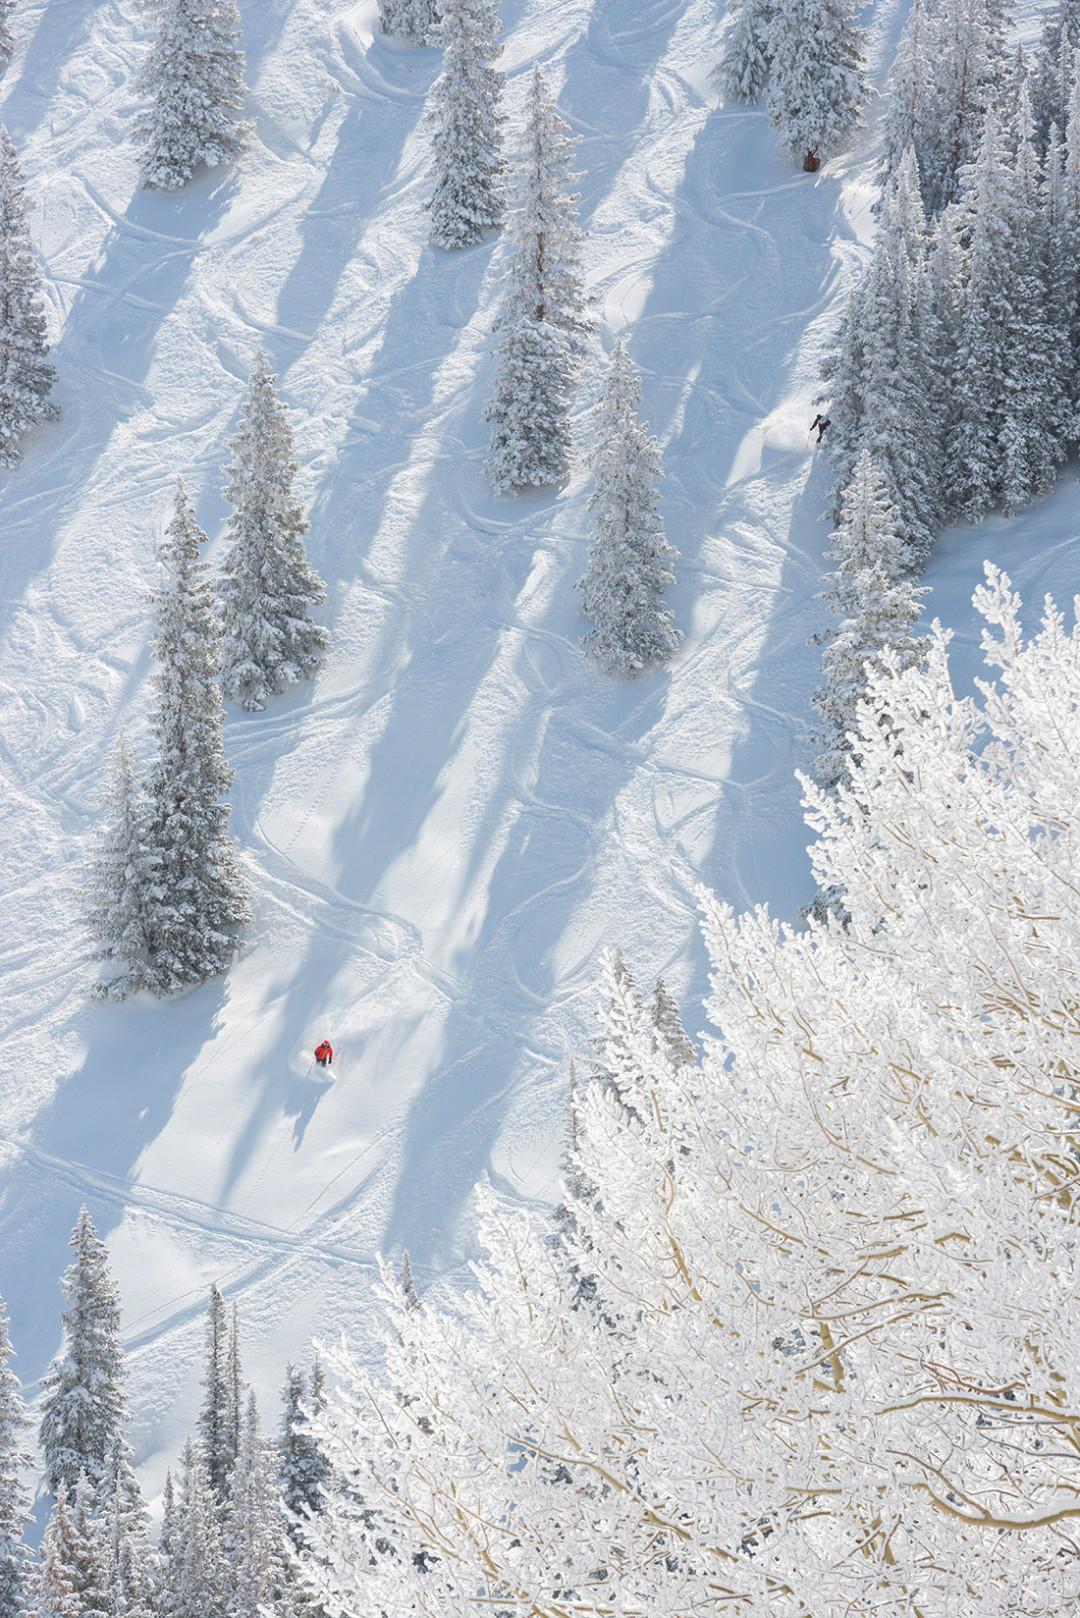 1114 slalom skier iknog2